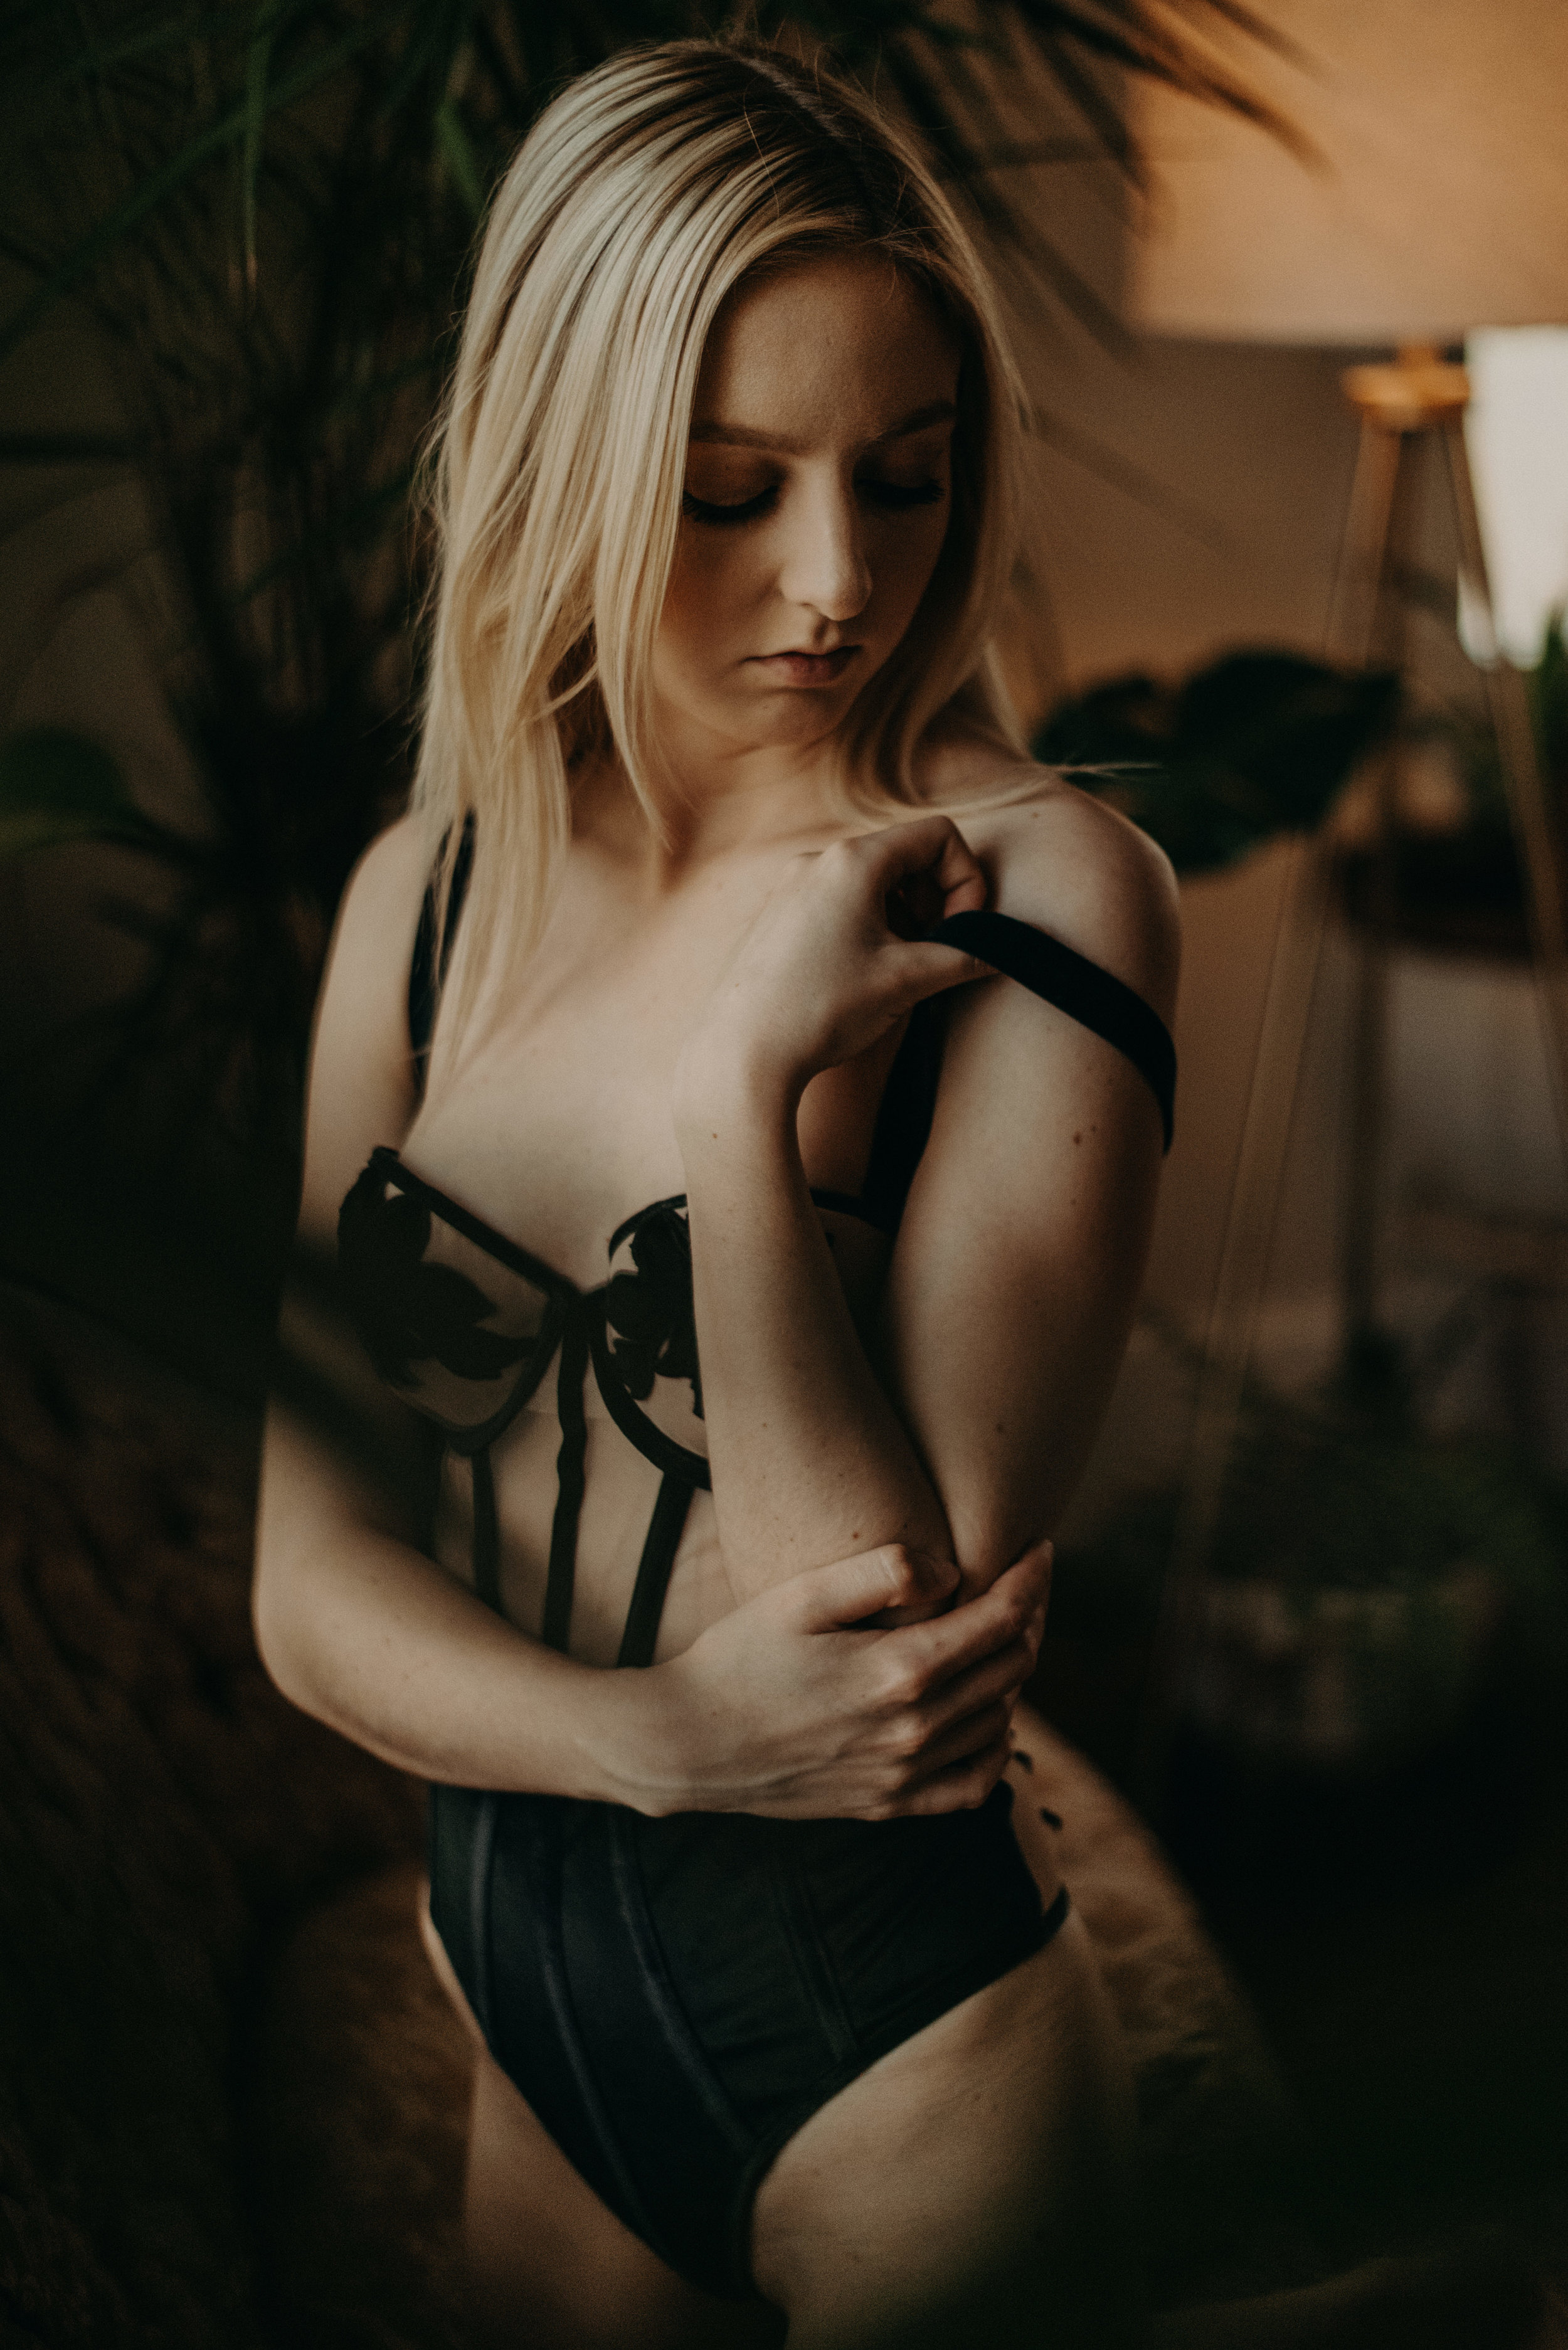 Taylor_English_Photography_Evans_Boudoir65.jpg